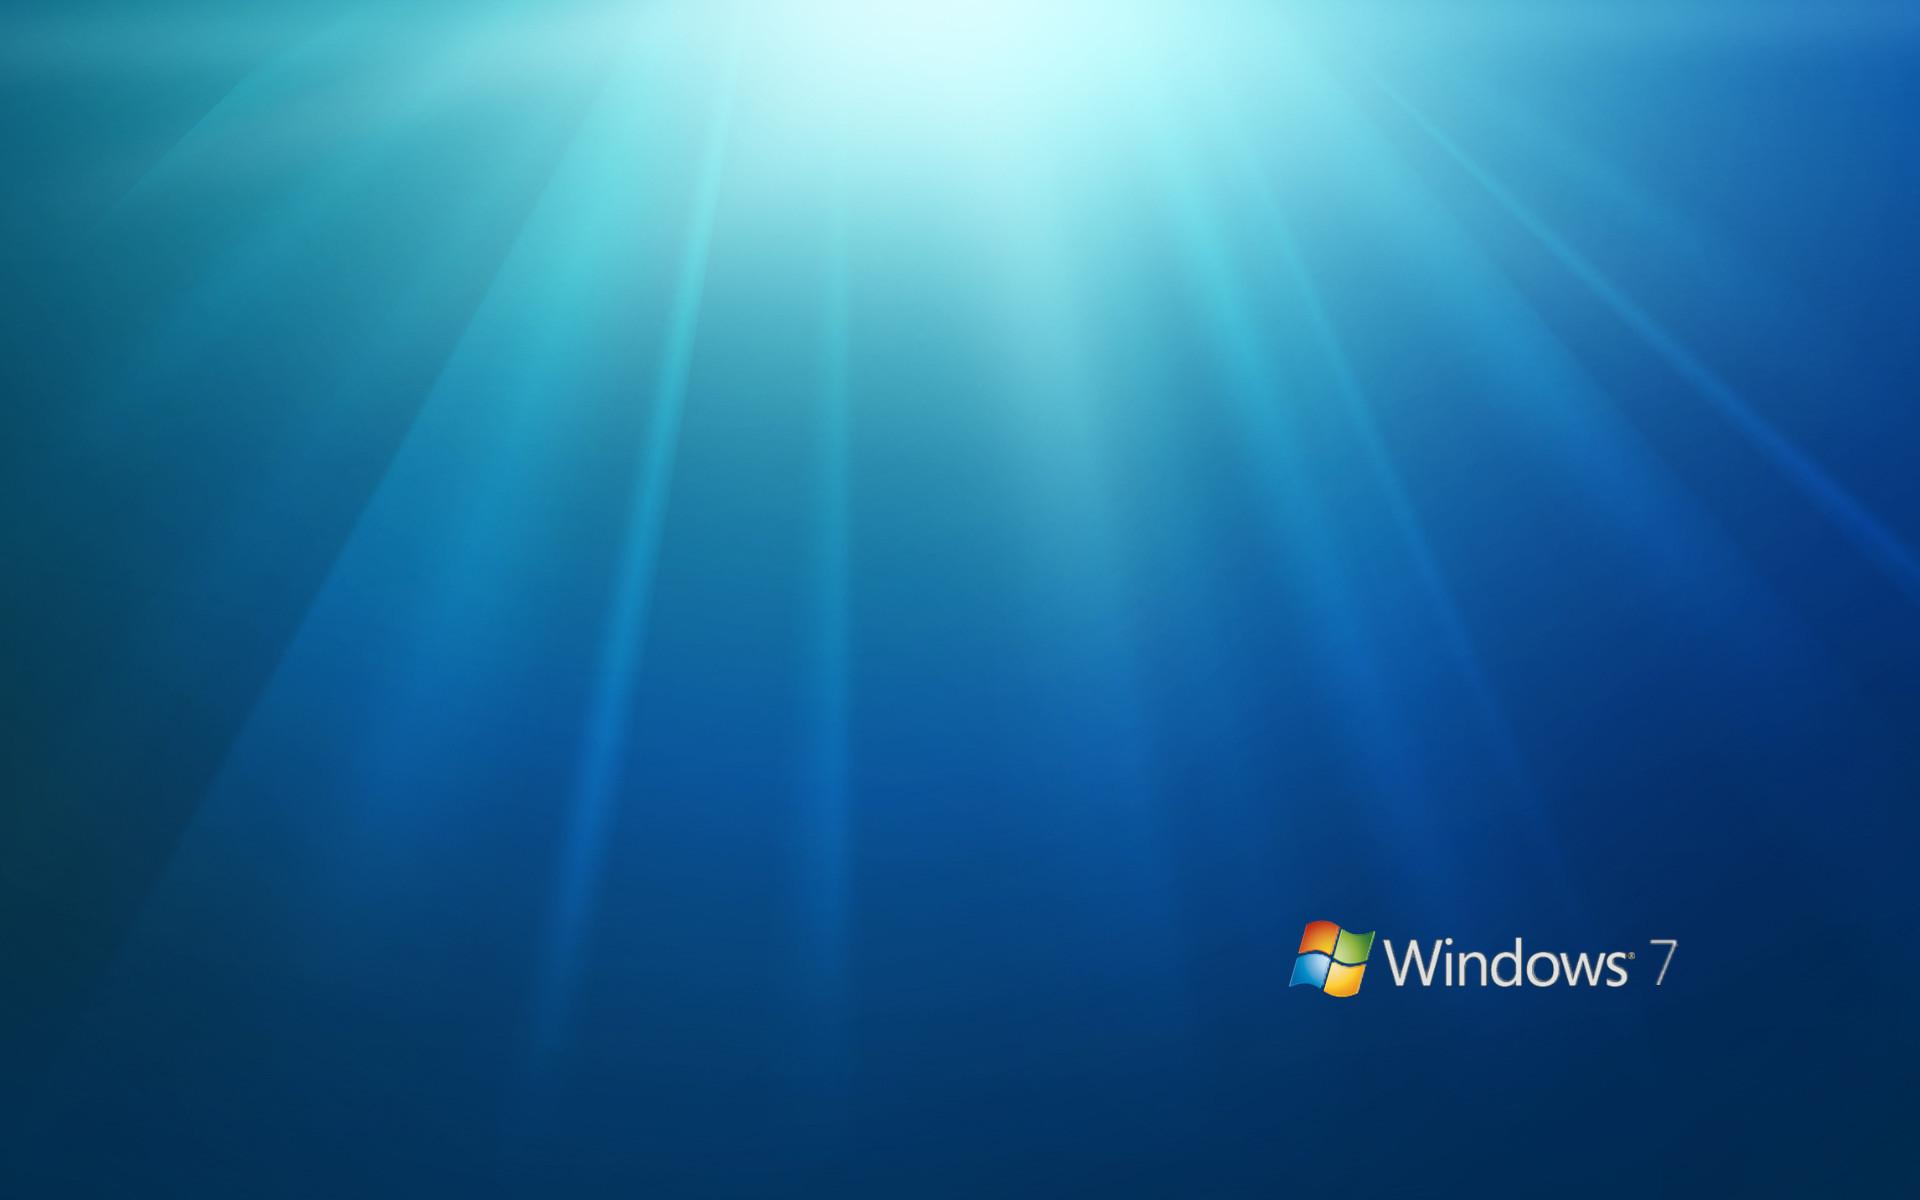 Windows 7 desktop background wallpaper download